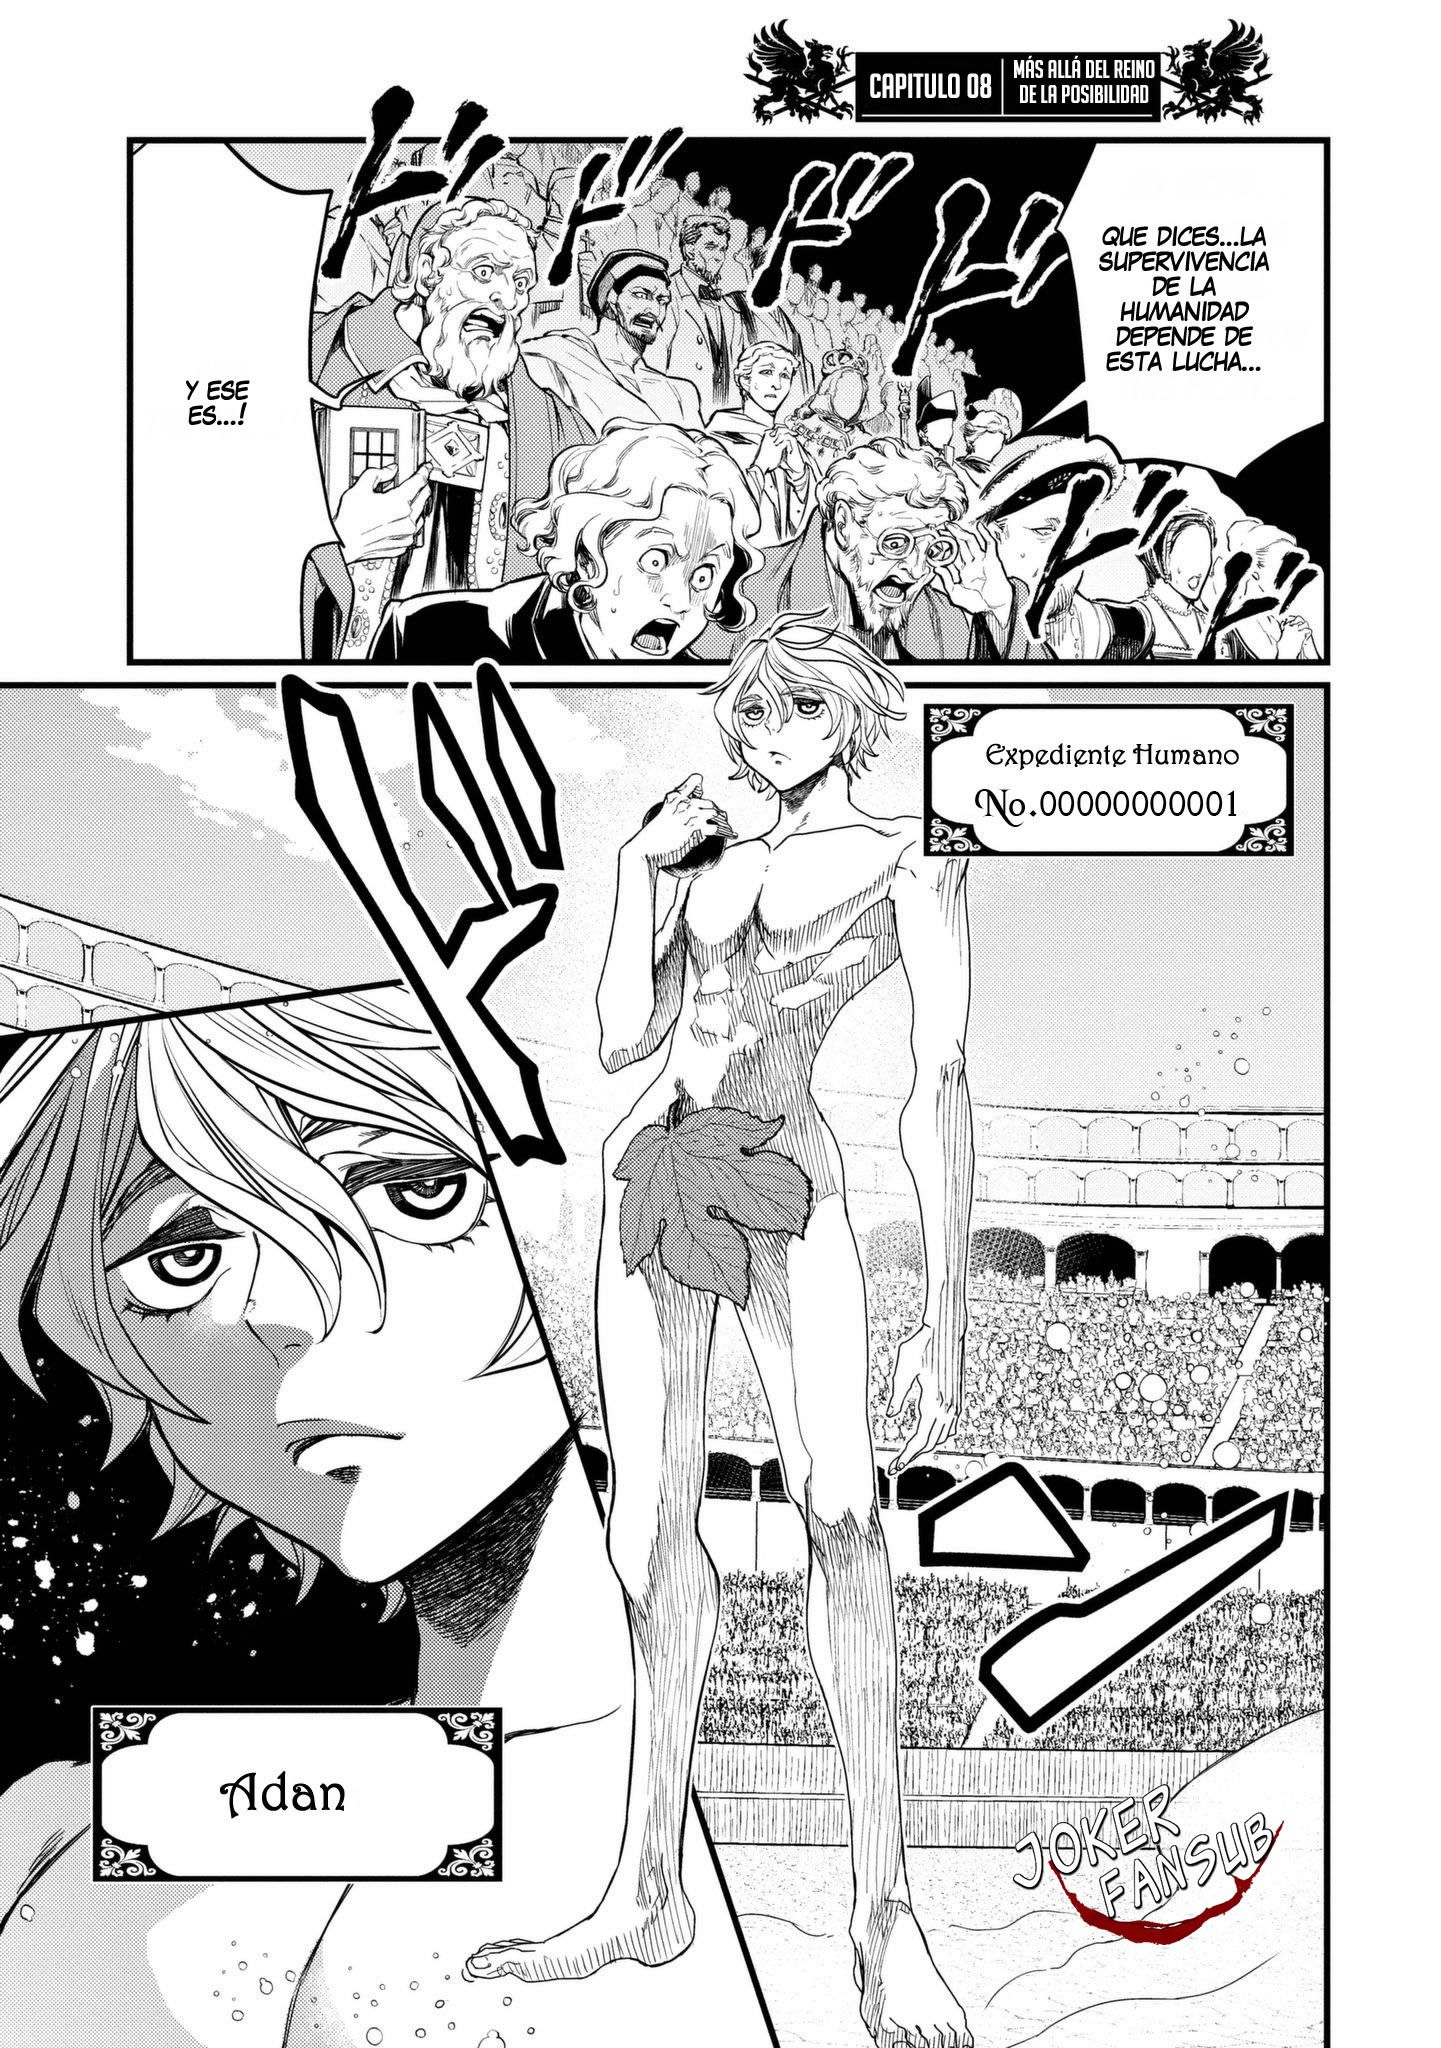 Shuumatsu No Valkyrie 08 Espanol Otaku Anime Dibujos De Anime